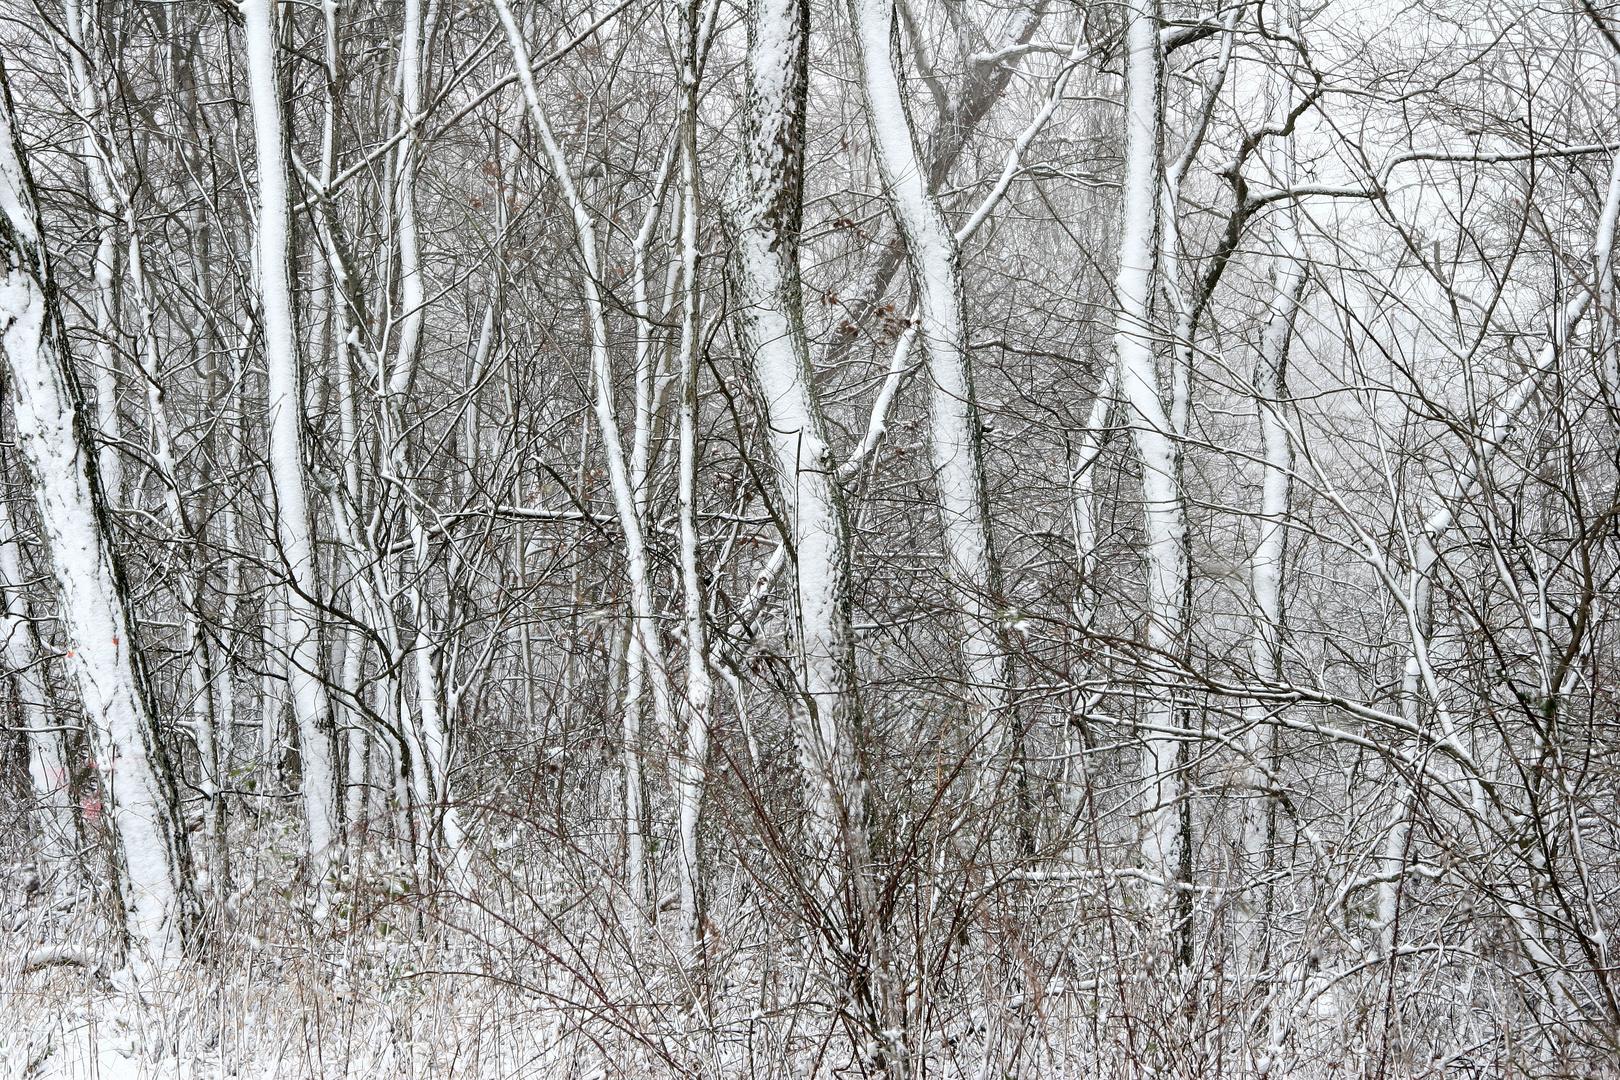 Nature's Chaos, Ohio